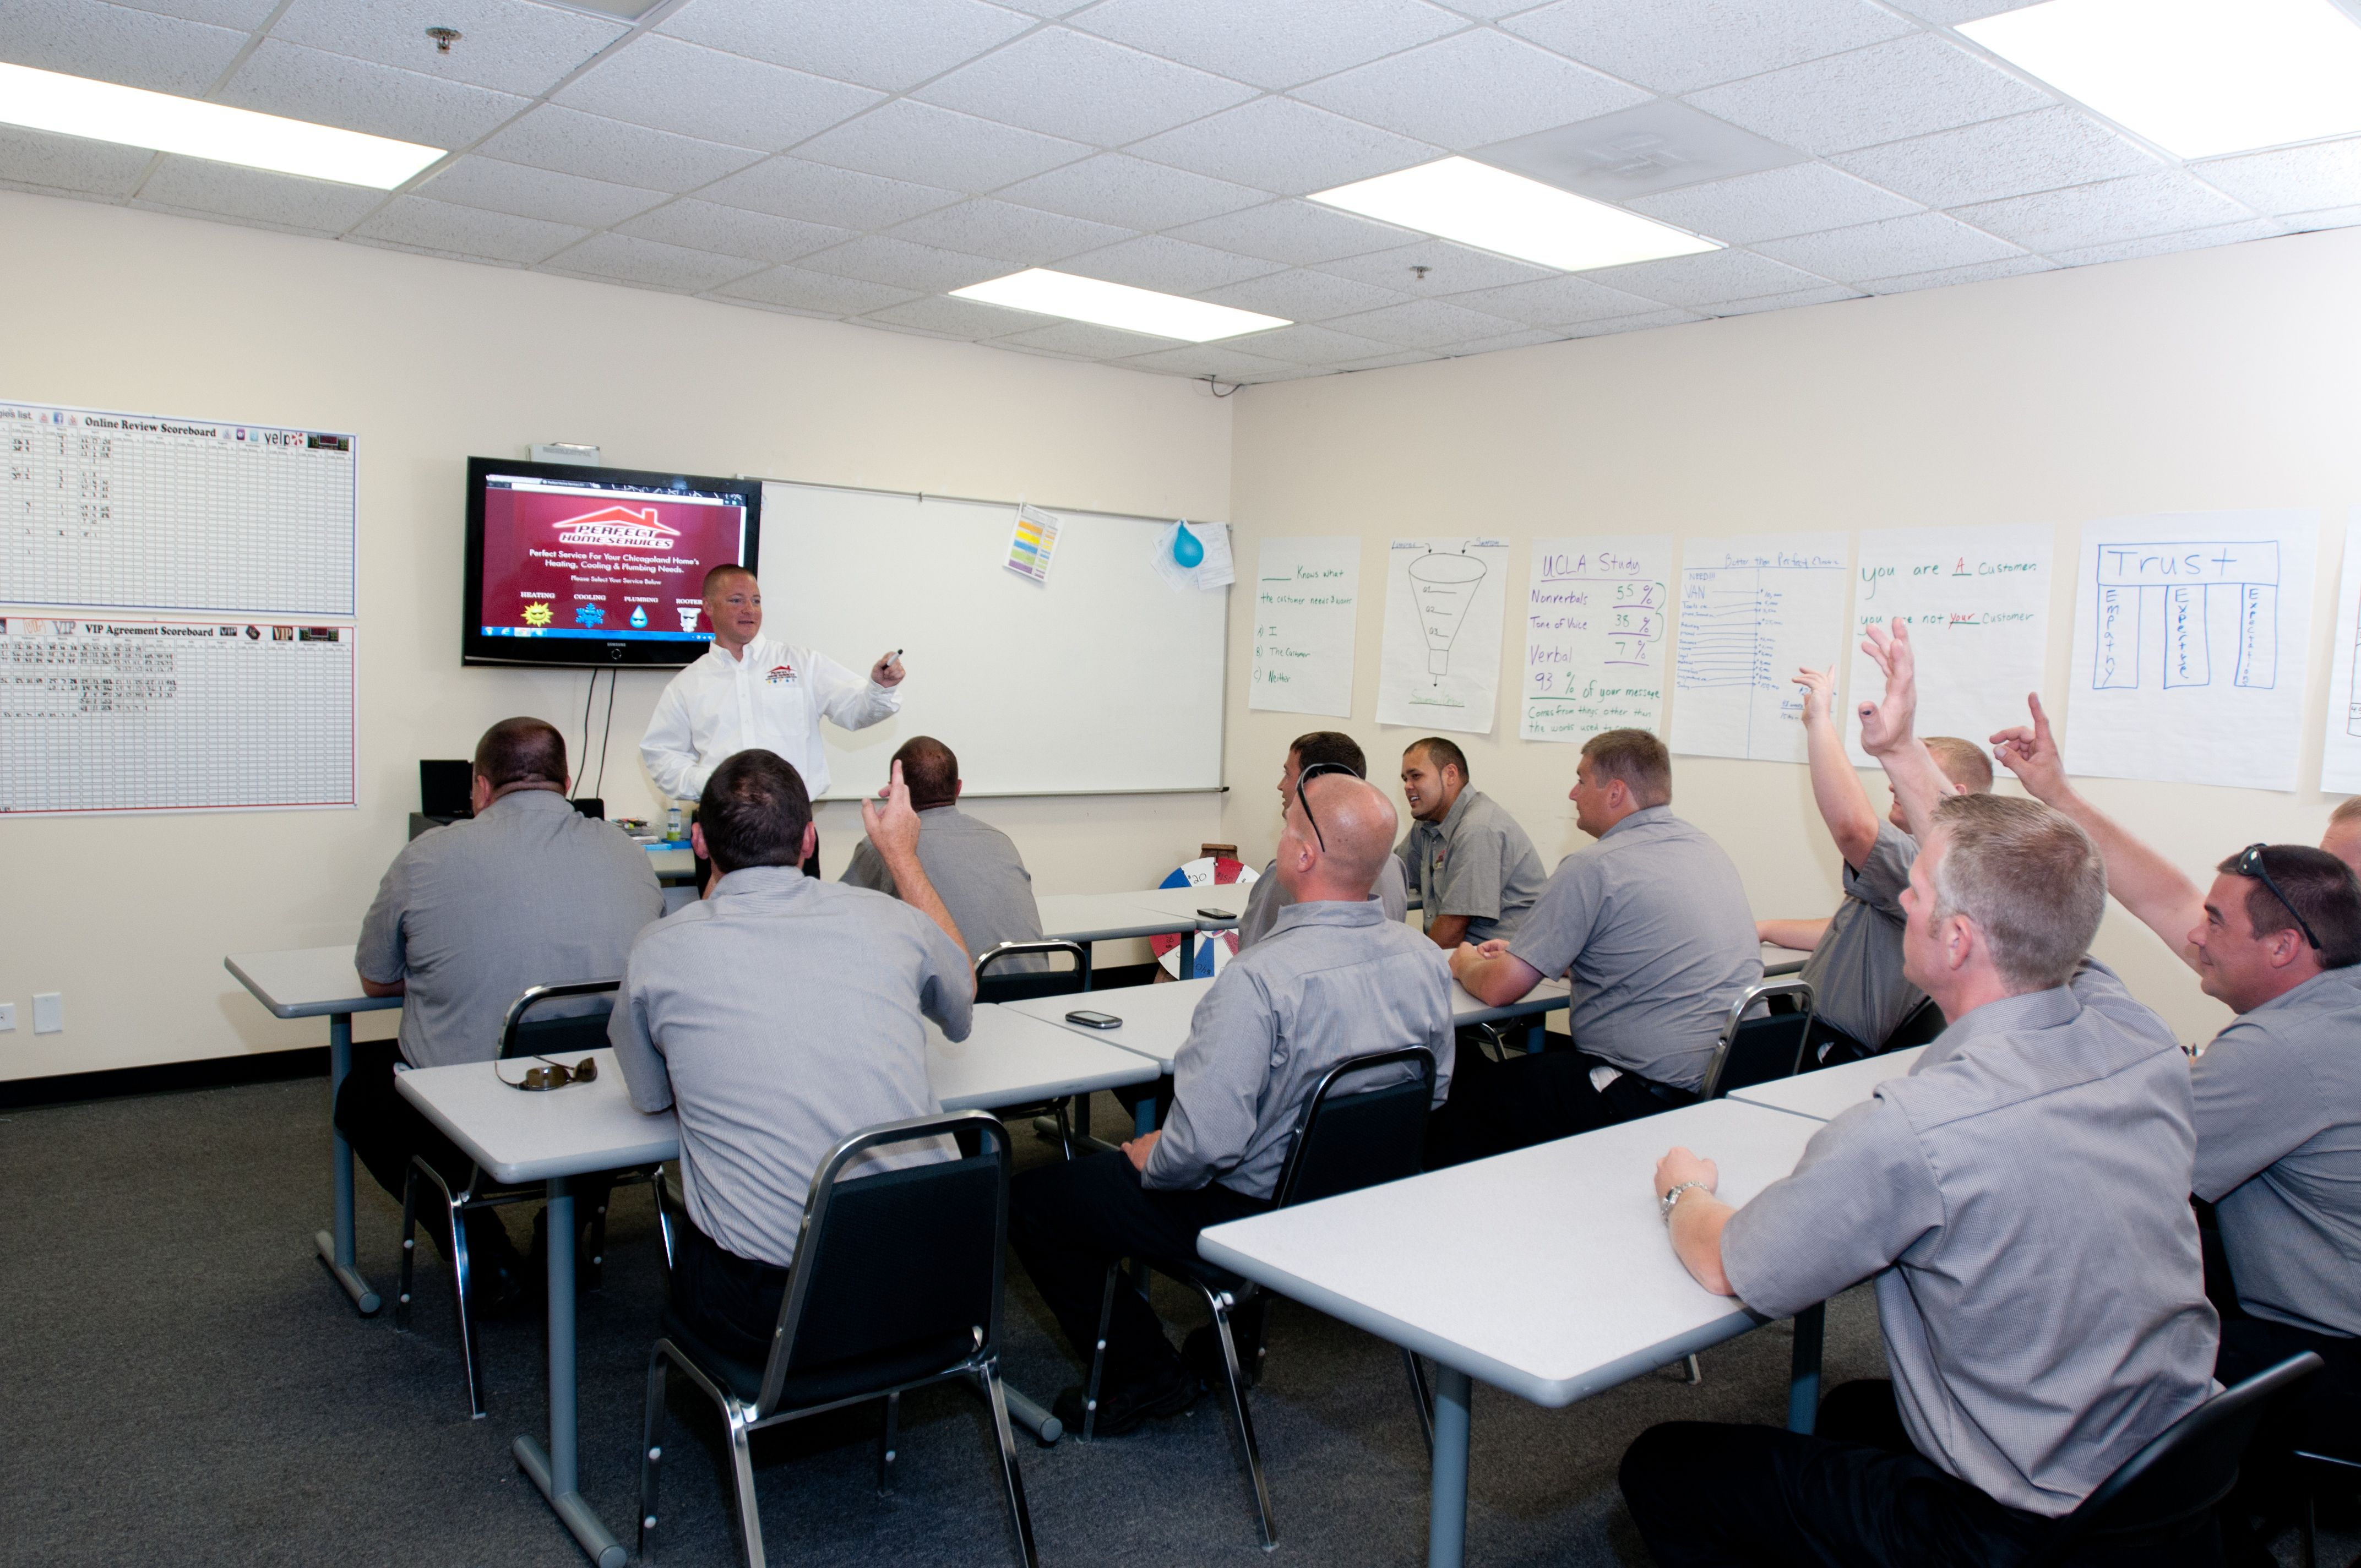 Blake Teaching A Class On Customer Service